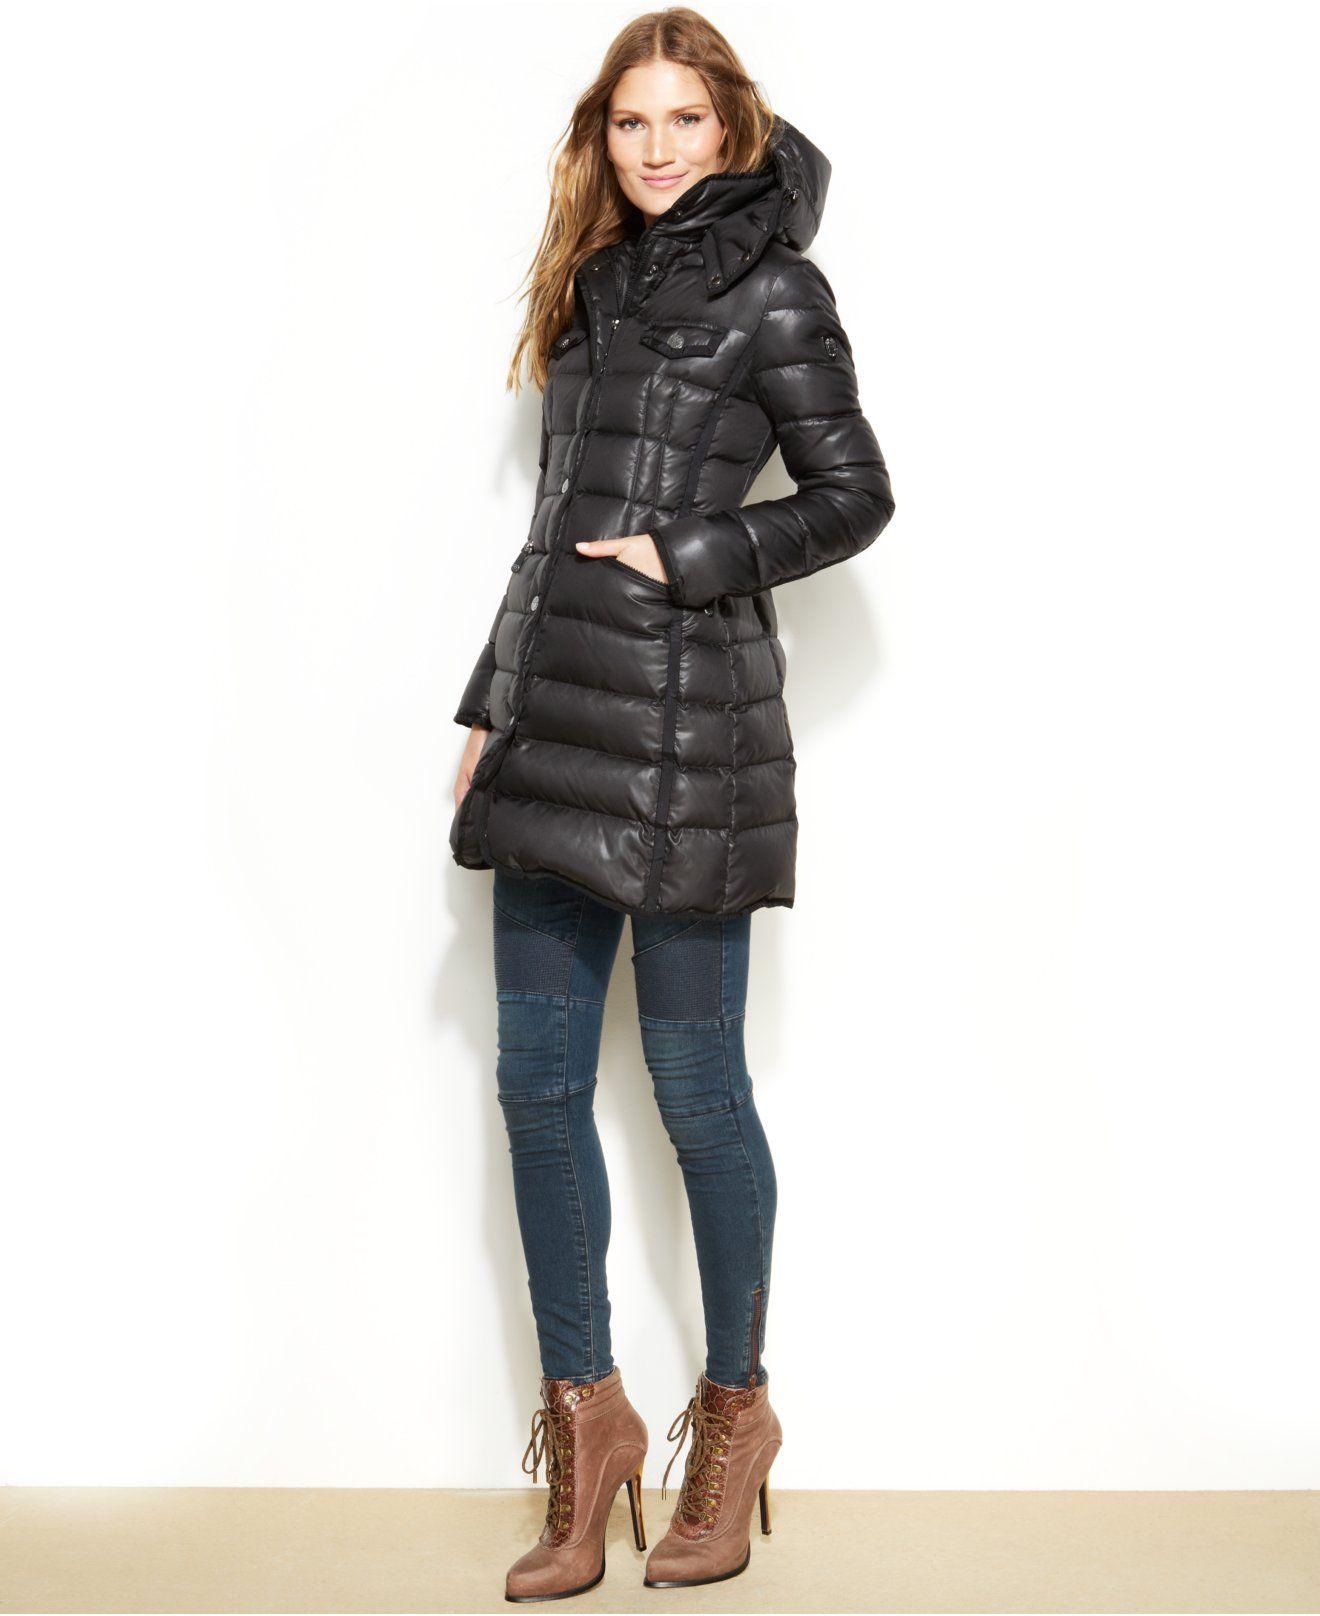 Vince Camuto Hooded Quilted Puffer Coat Coats Women Macy S Puffer Jacket Women Coats For Women Puffer Coat [ 1616 x 1320 Pixel ]